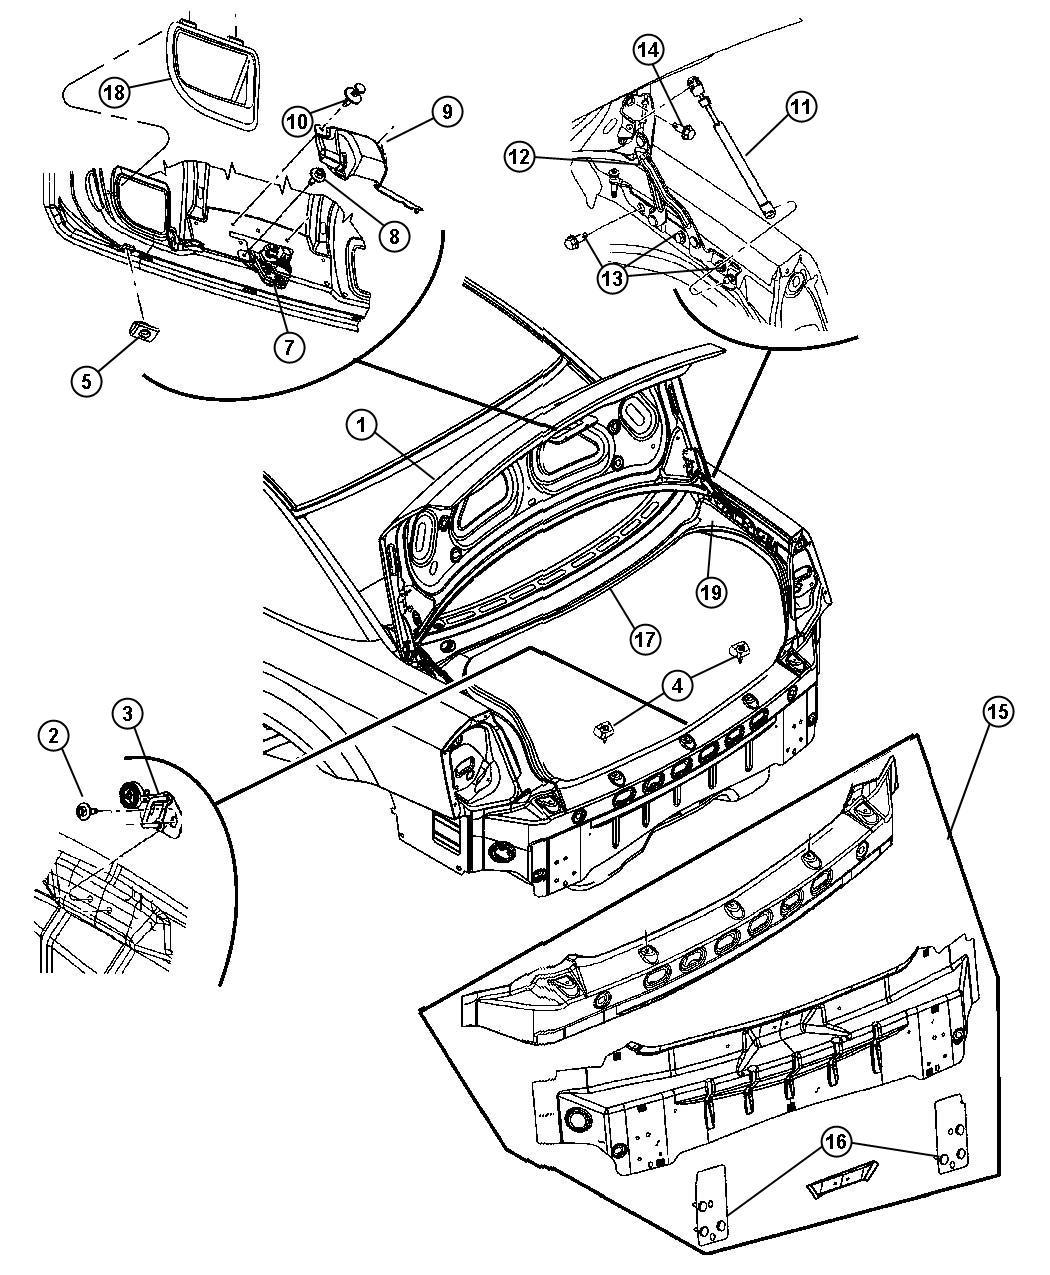 Dodge Charger Bumper Deck Lid Overslam